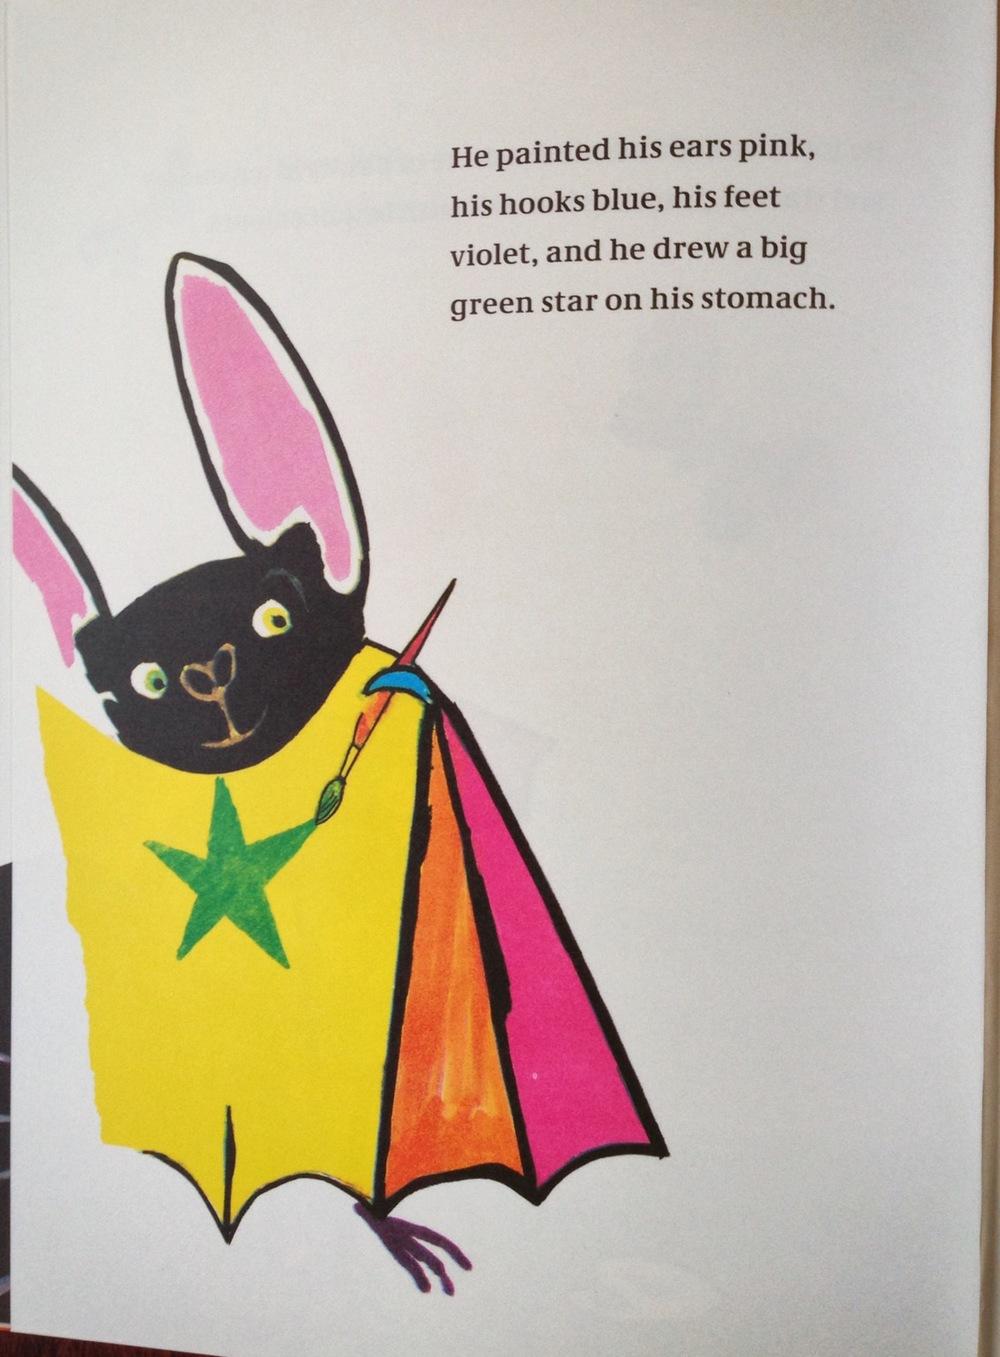 Rufus, not your average bat.